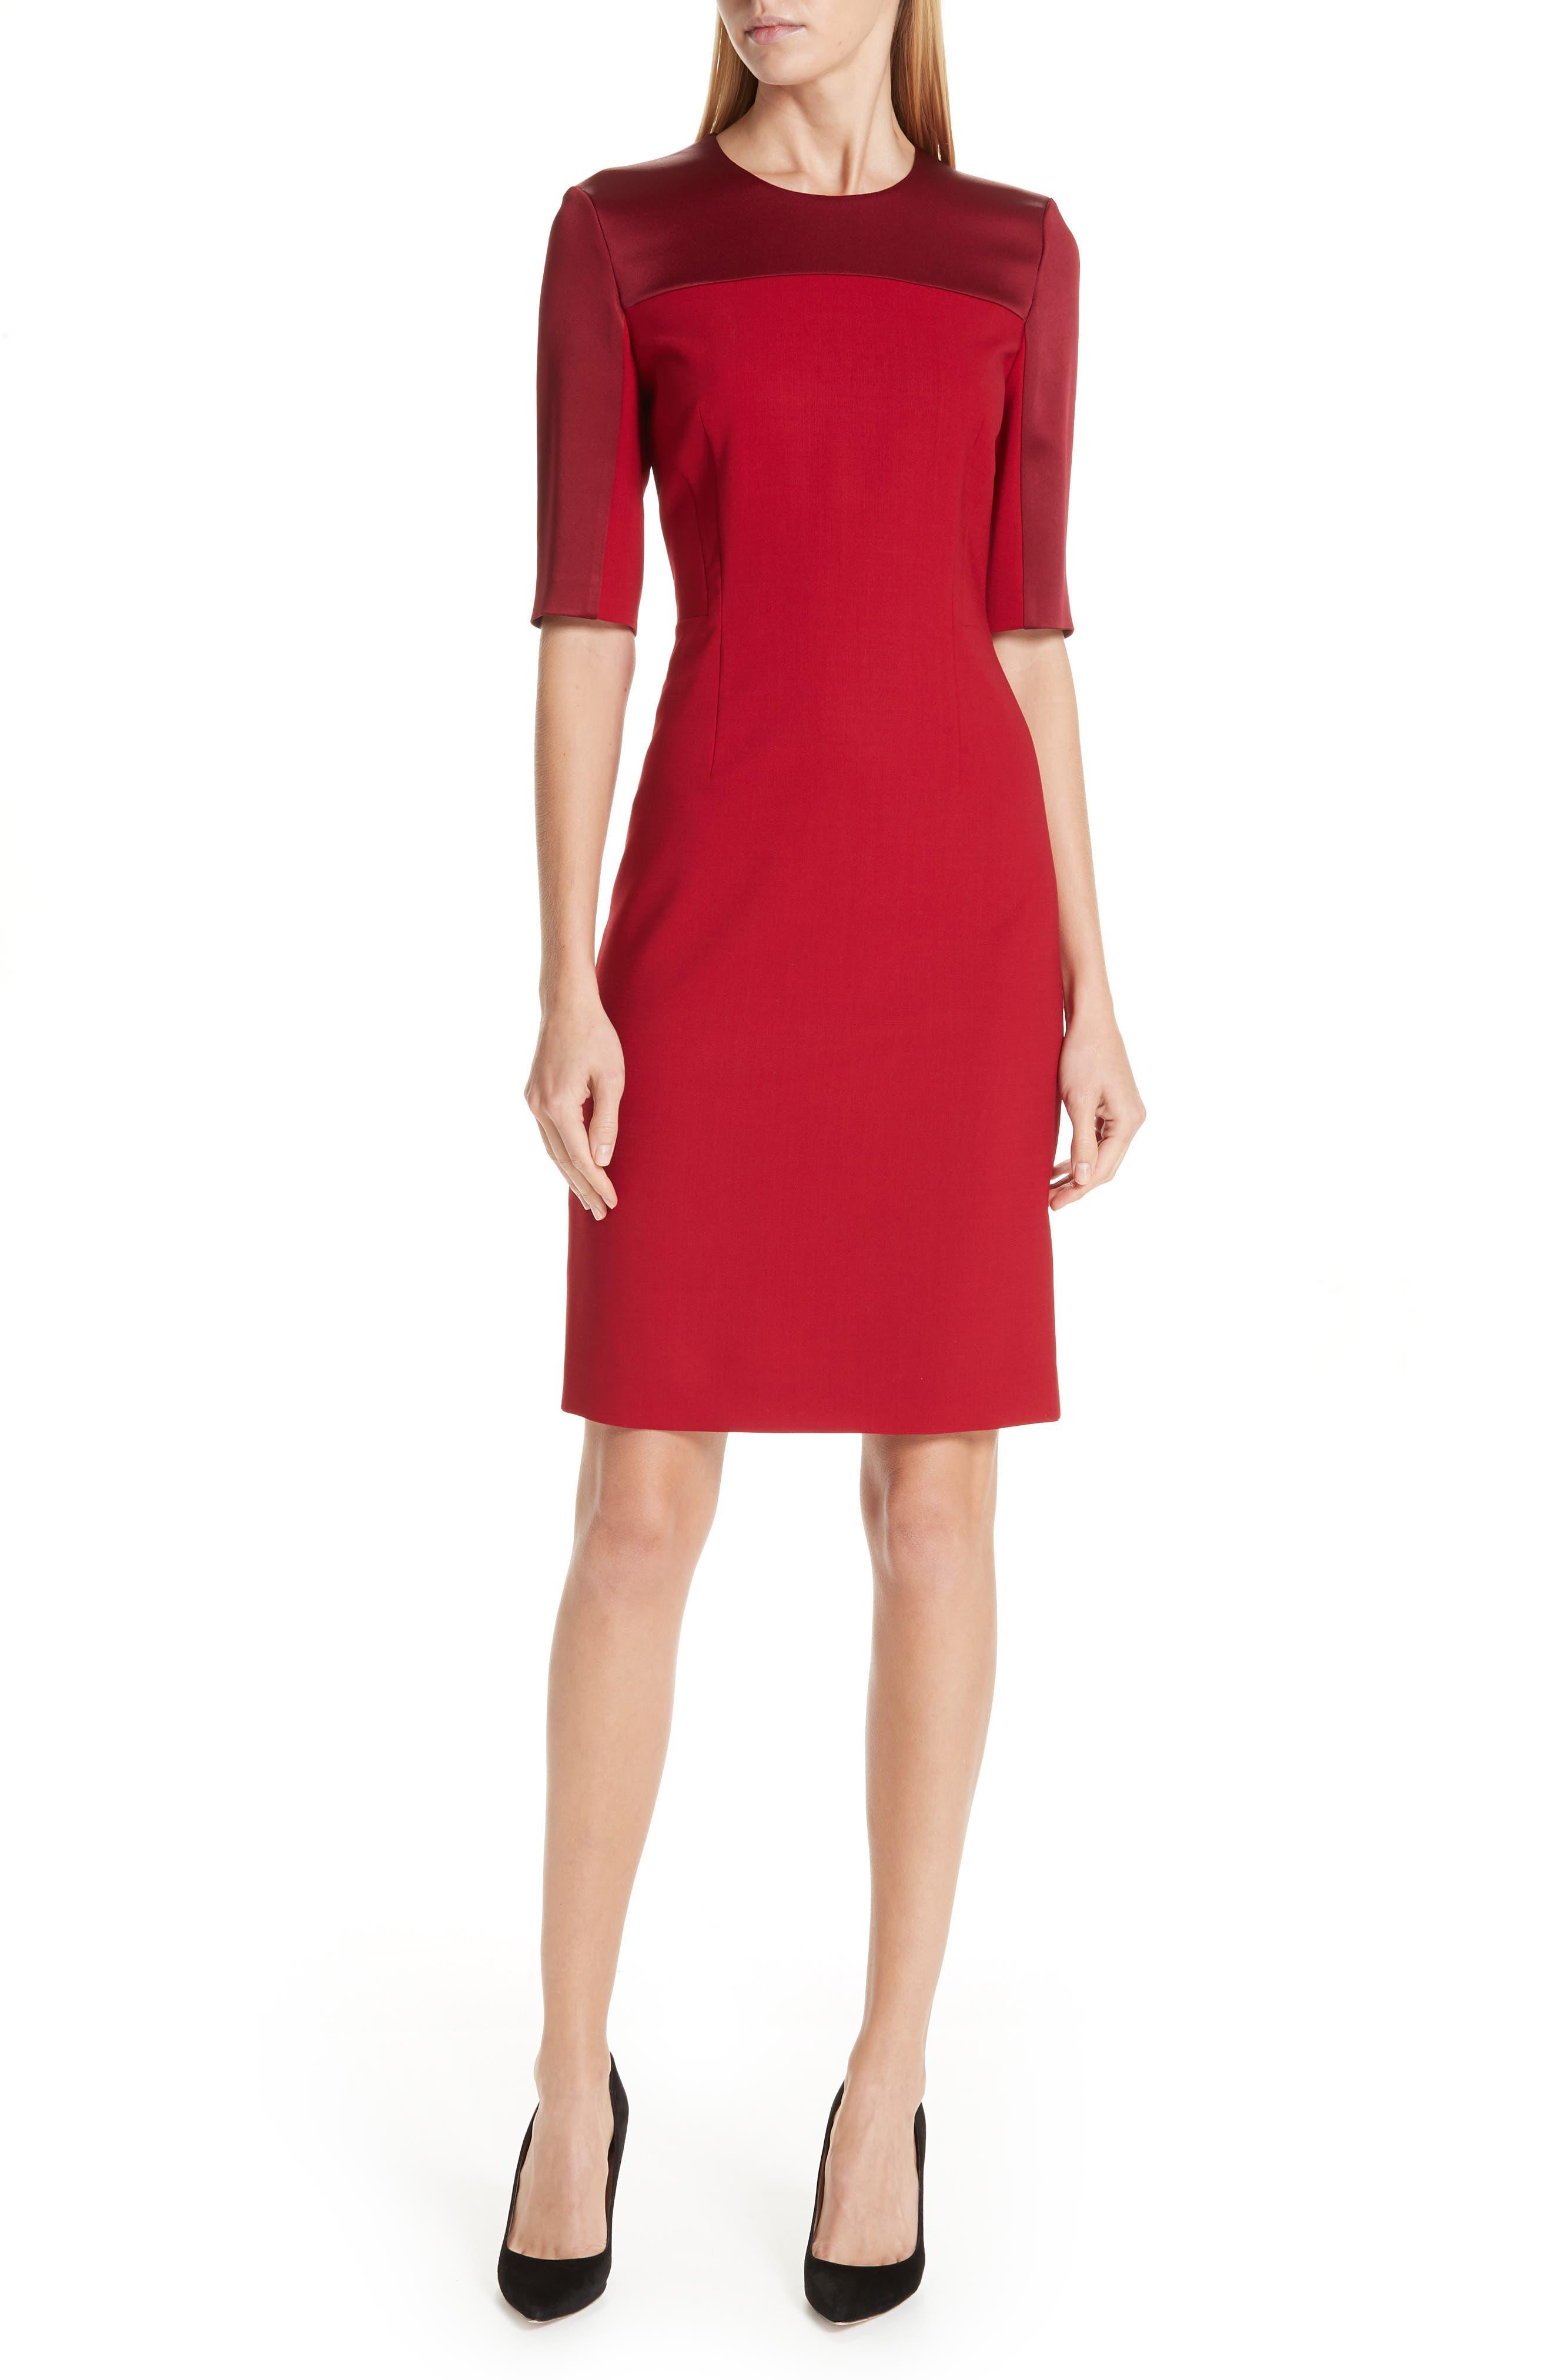 Danufa Stretch Wool Sheath Dress,                             Main thumbnail 1, color,                             DARK RED